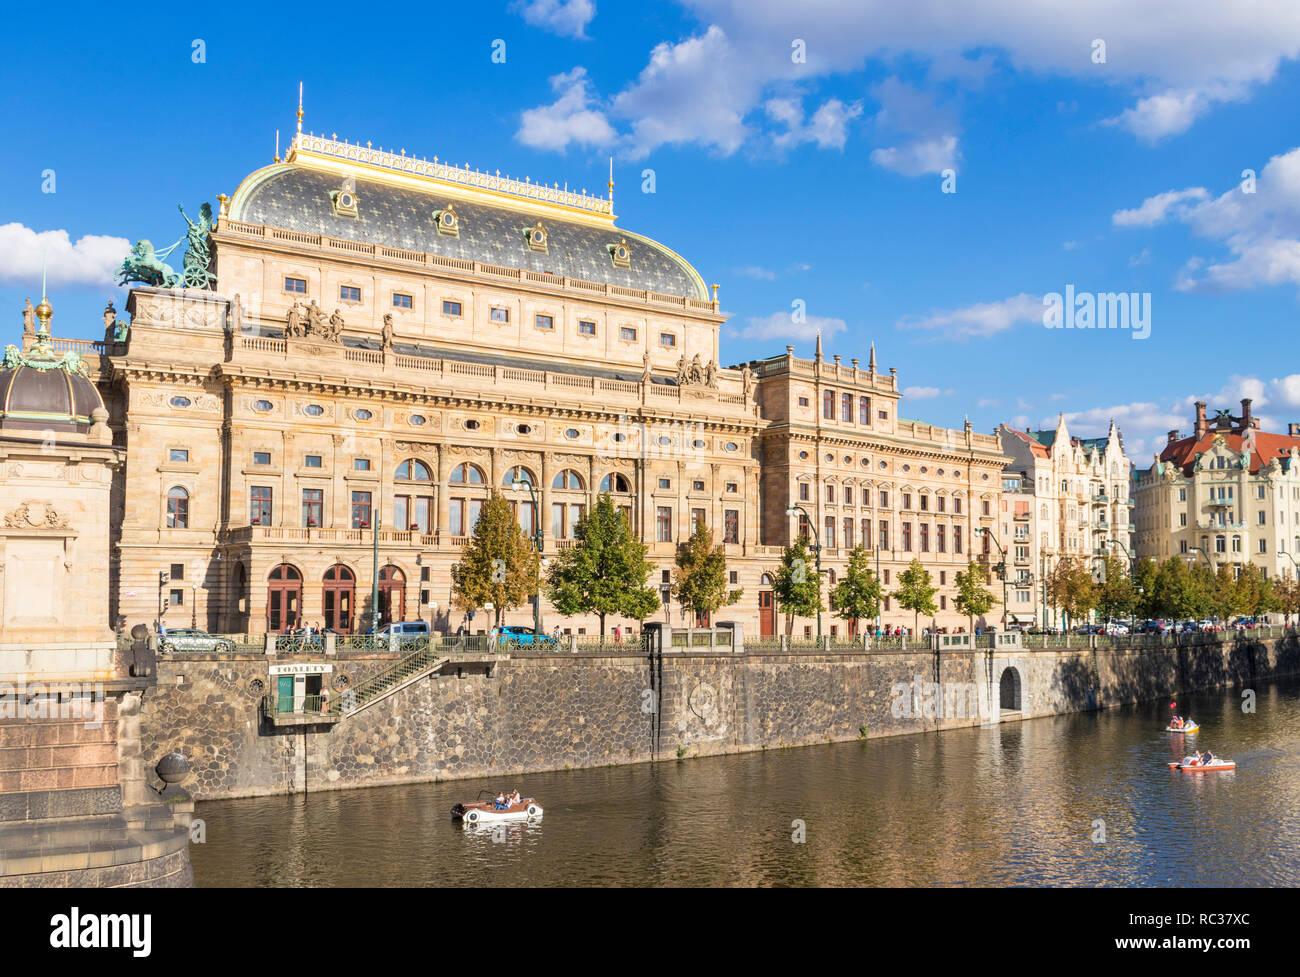 Prague National Theatre Národní divadlo on the banks of the river Vltava Prague Czech Republic Europe - Stock Image